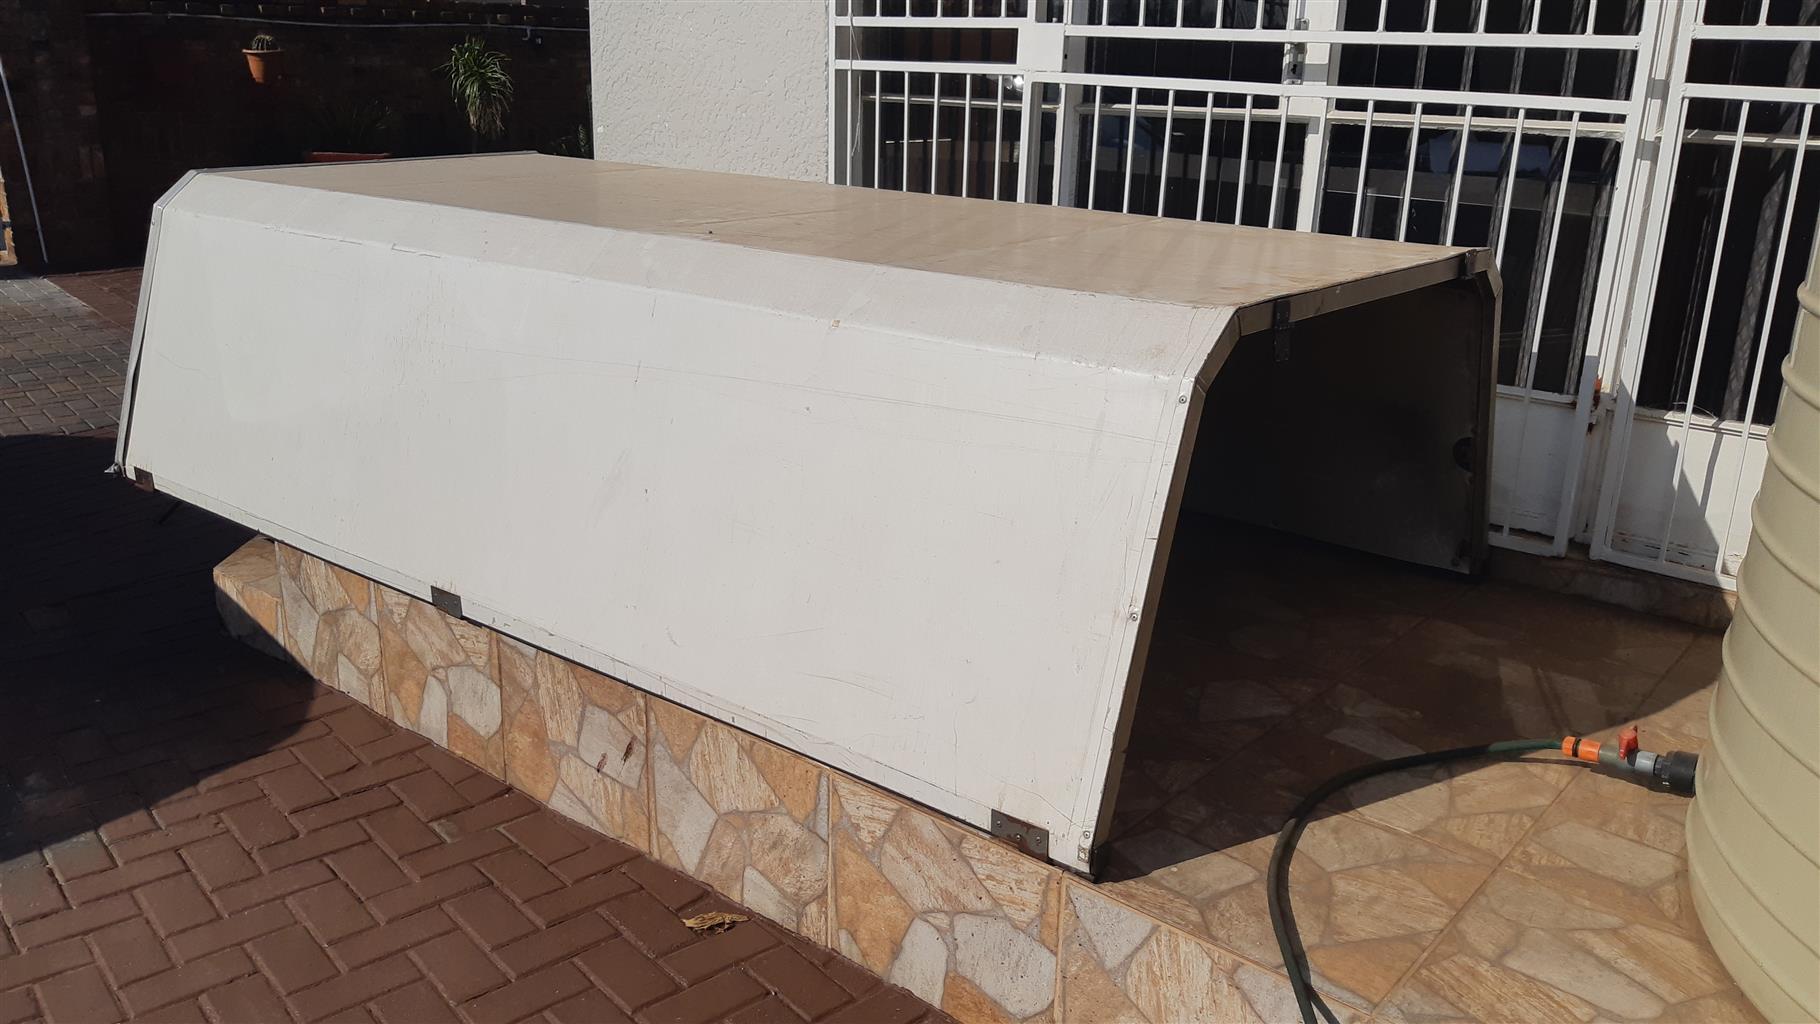 canopie for JMC